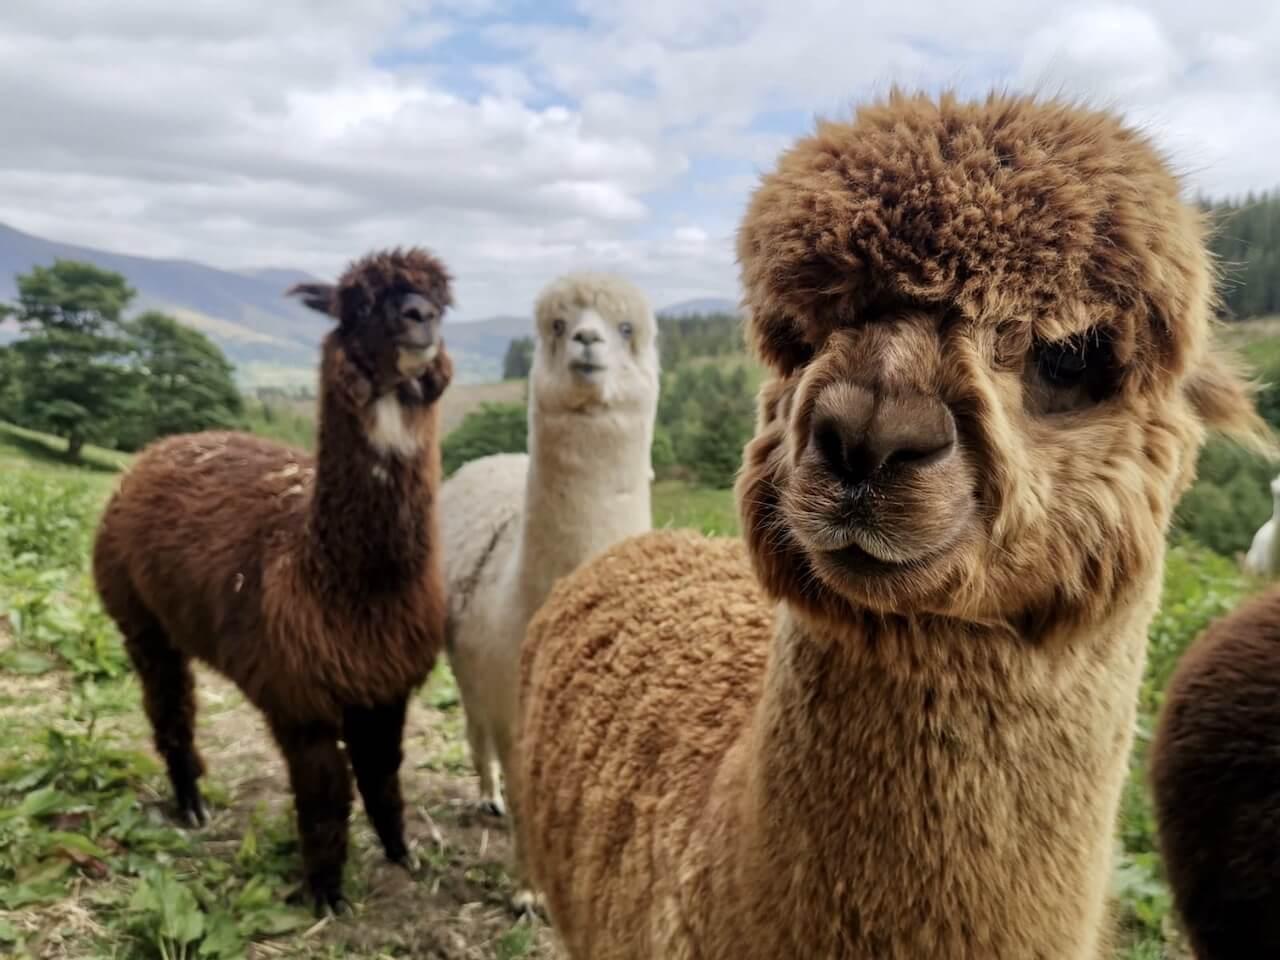 alpaca adventure in wales, uk.